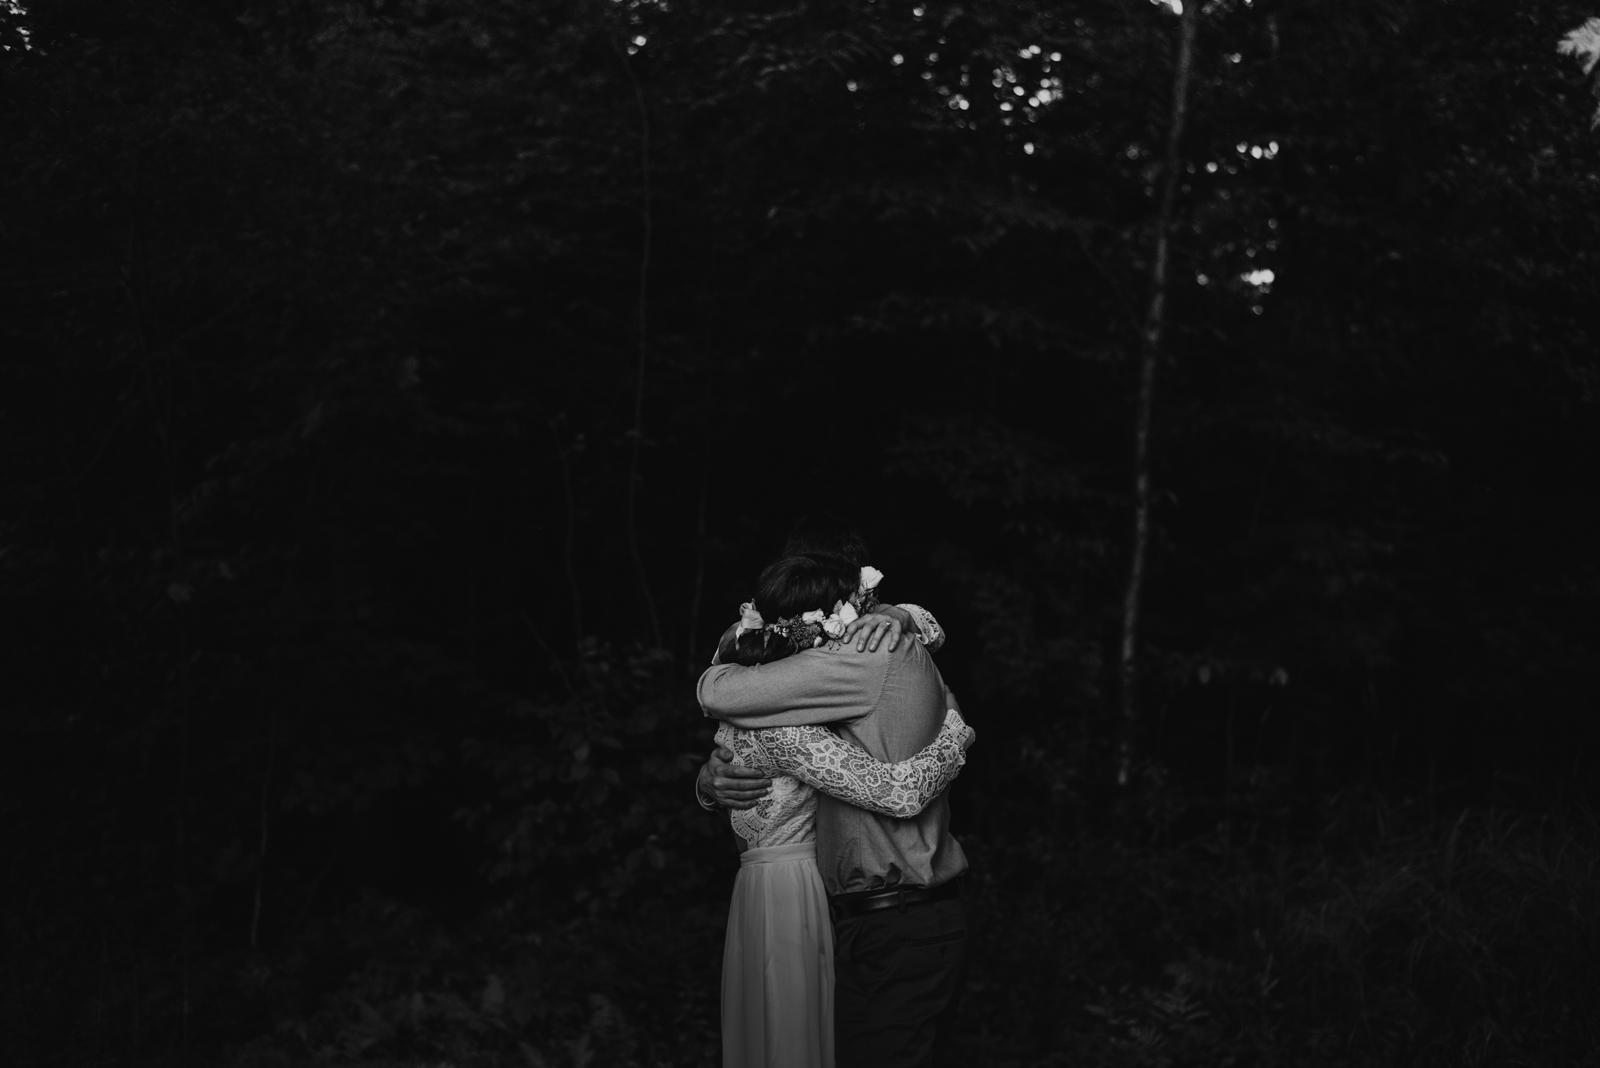 08192018-JessicaJordan-JuliaLuckettPhotography-303.jpg